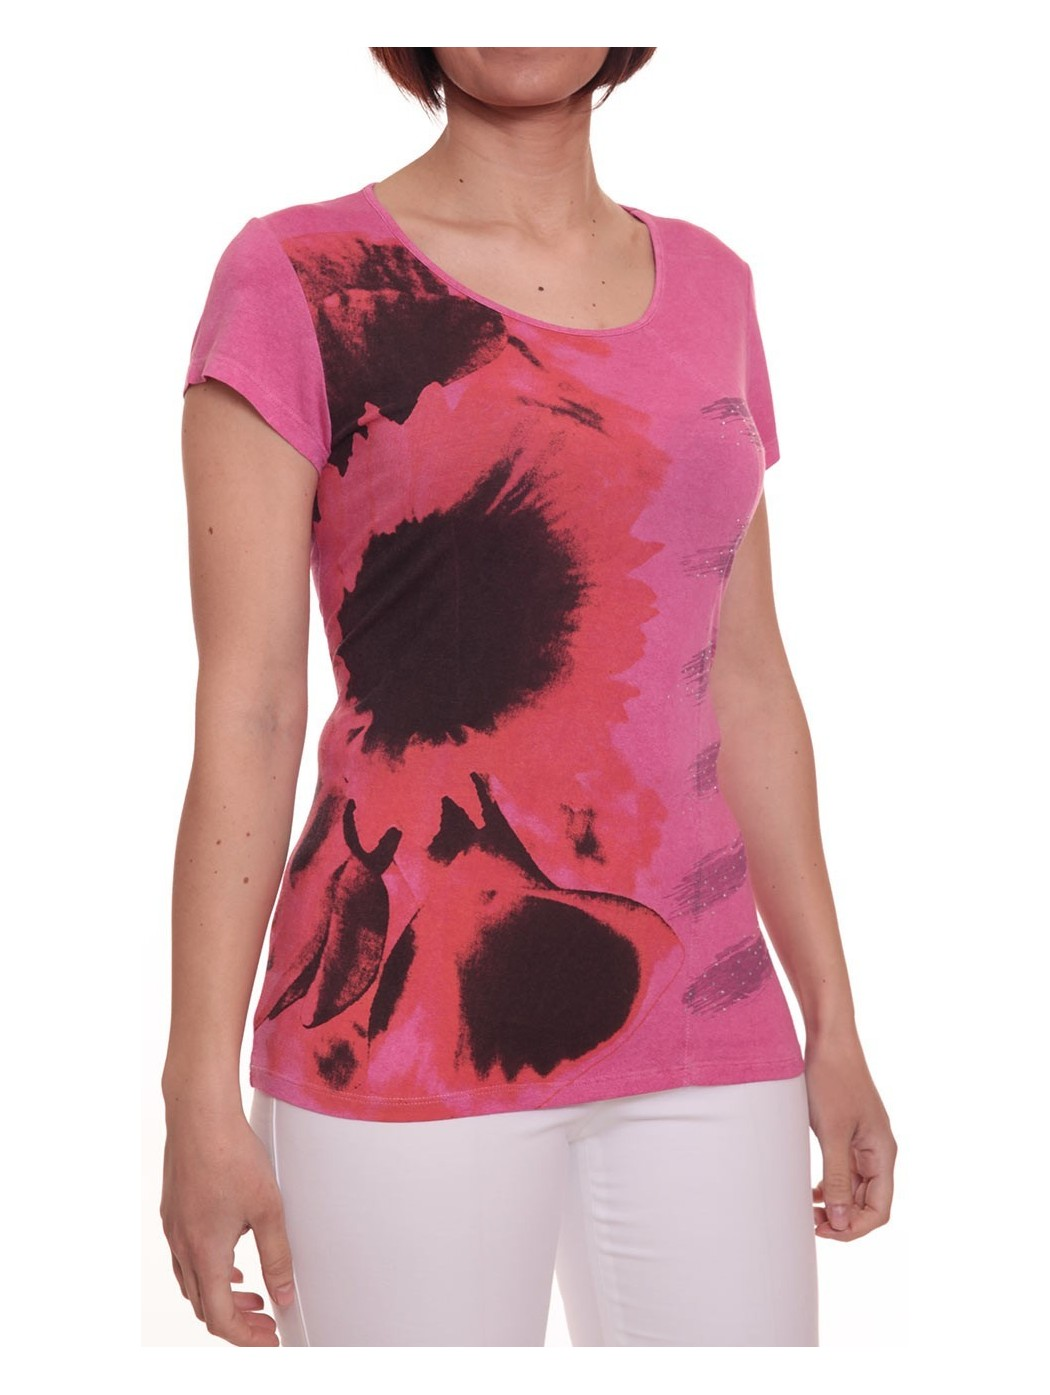 Roberta Picchiante T-shirt